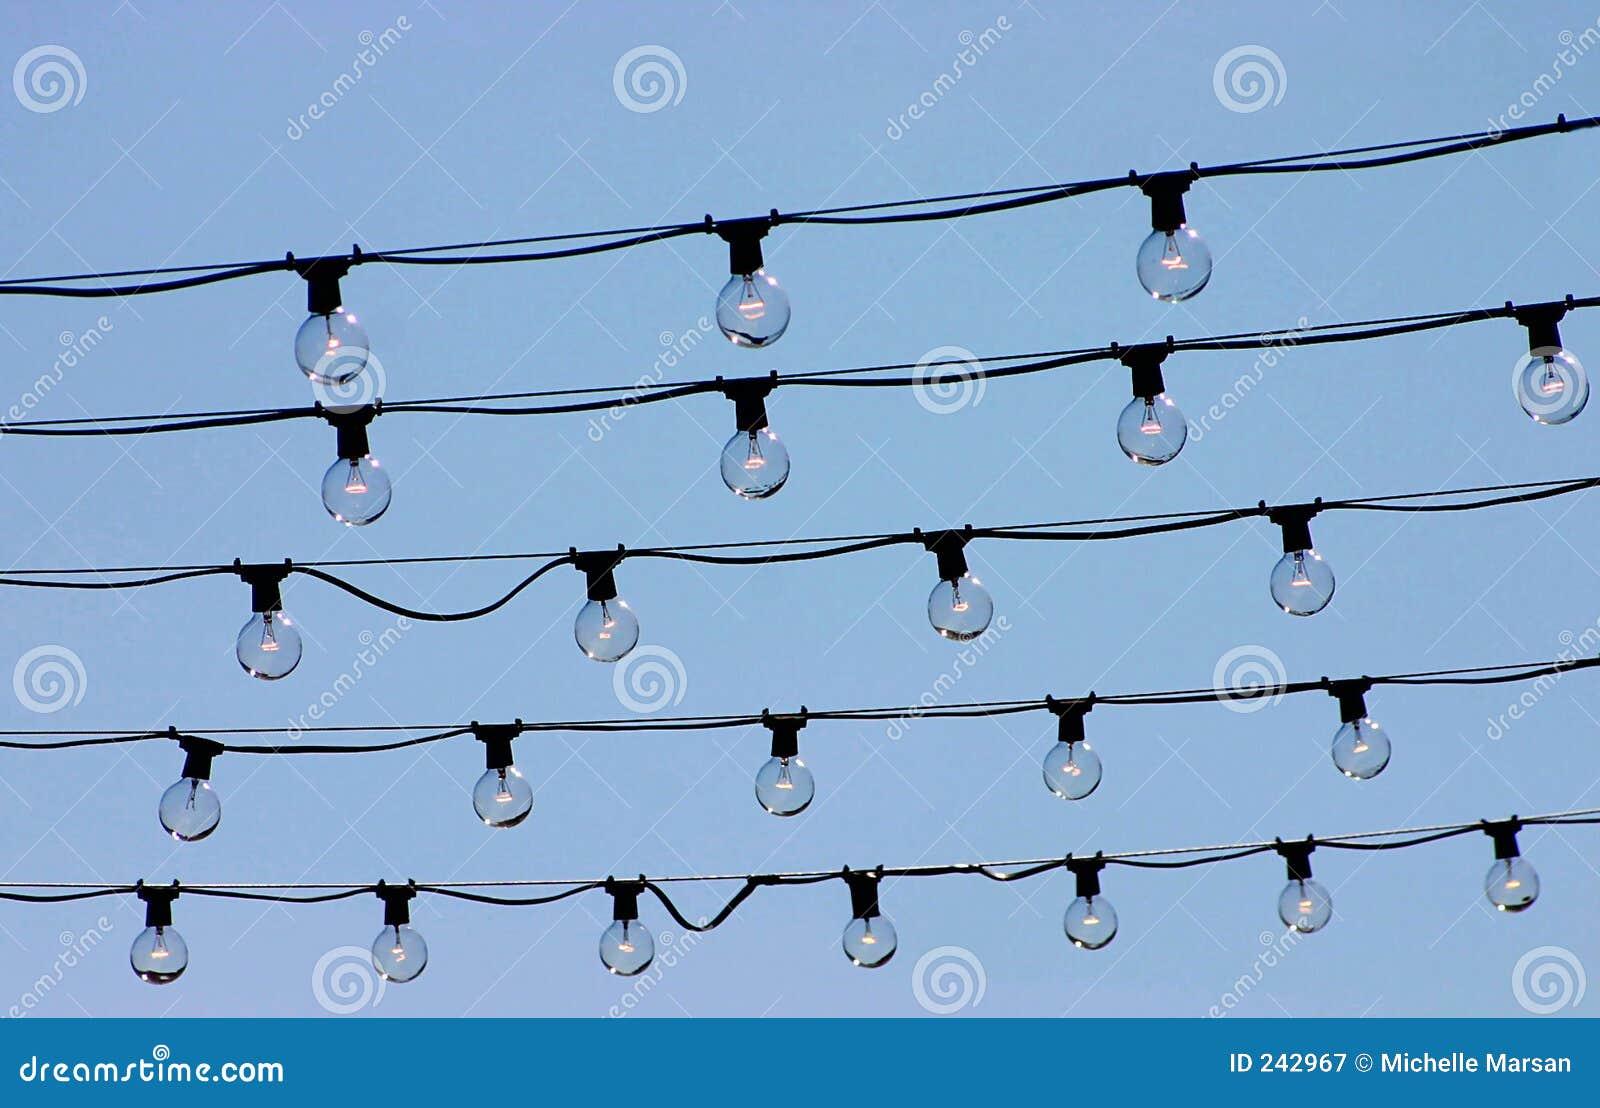 Lights strings